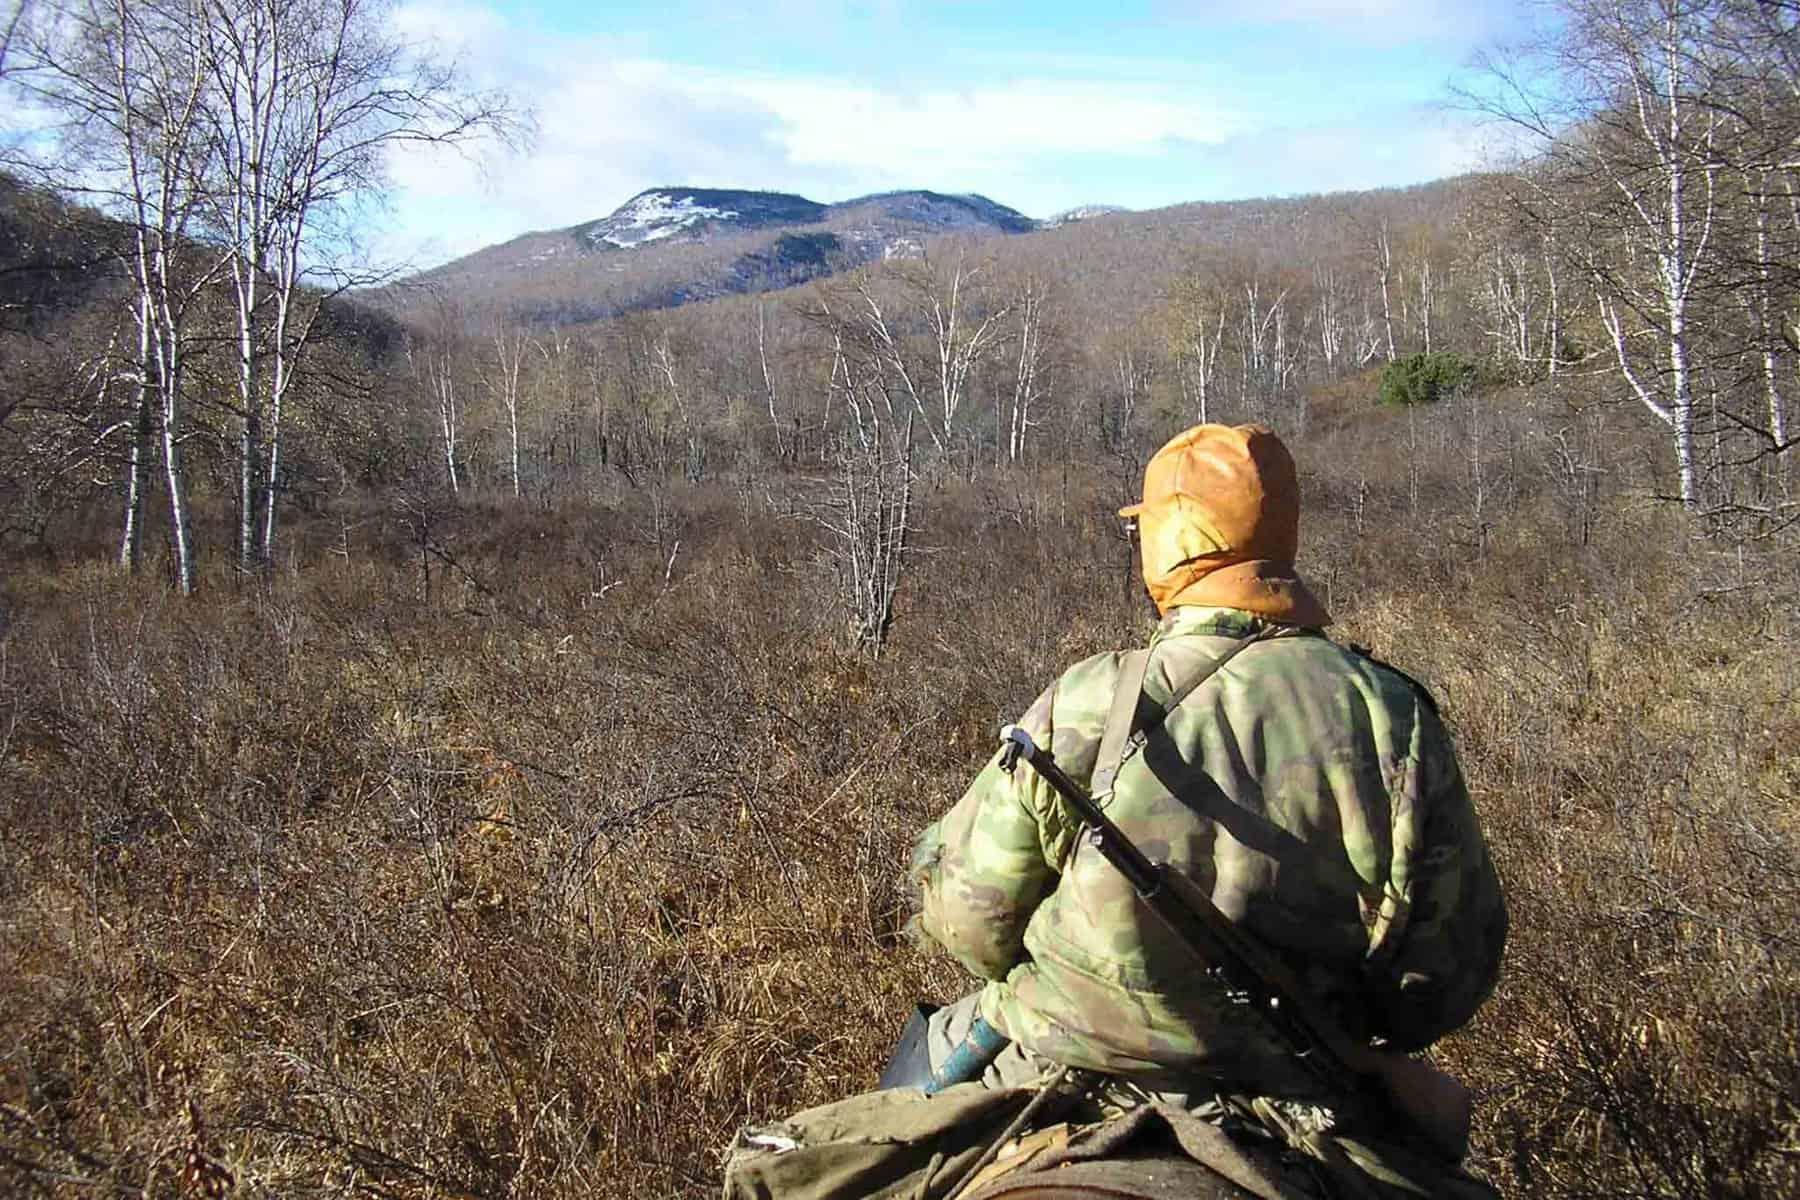 Jagdreise-Kamtschatka